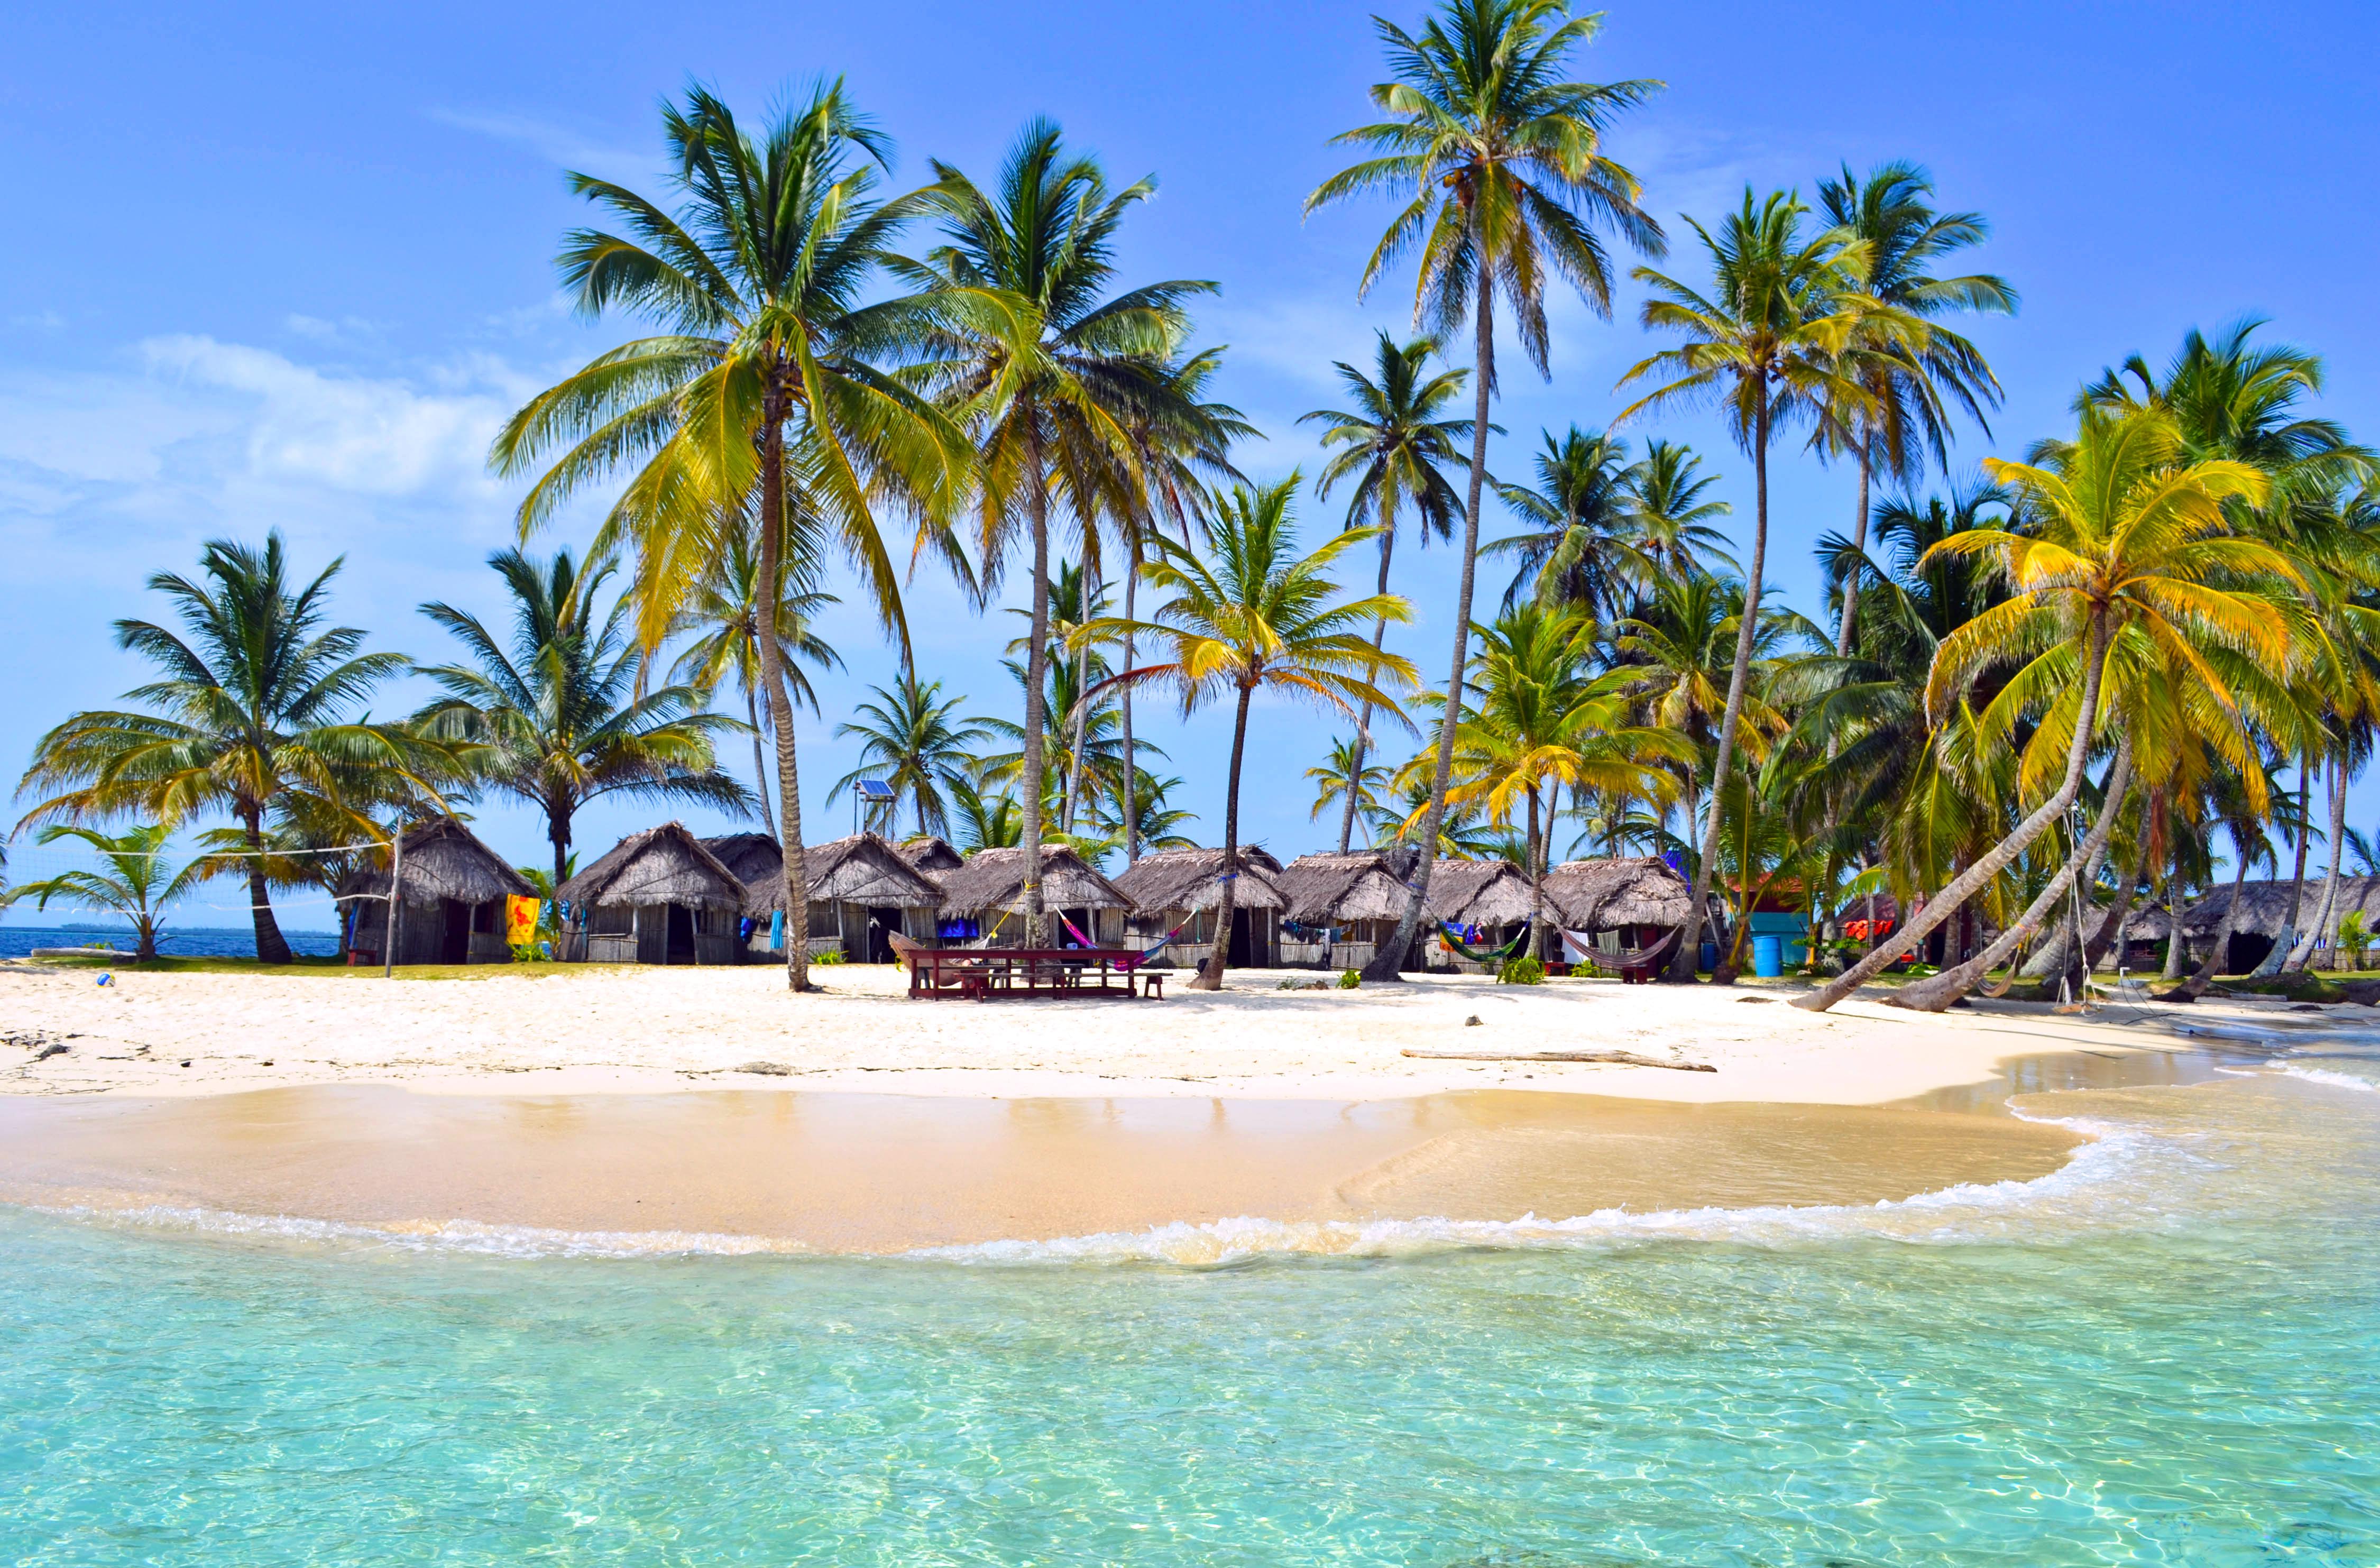 Пляжи на островах с пальмами фото